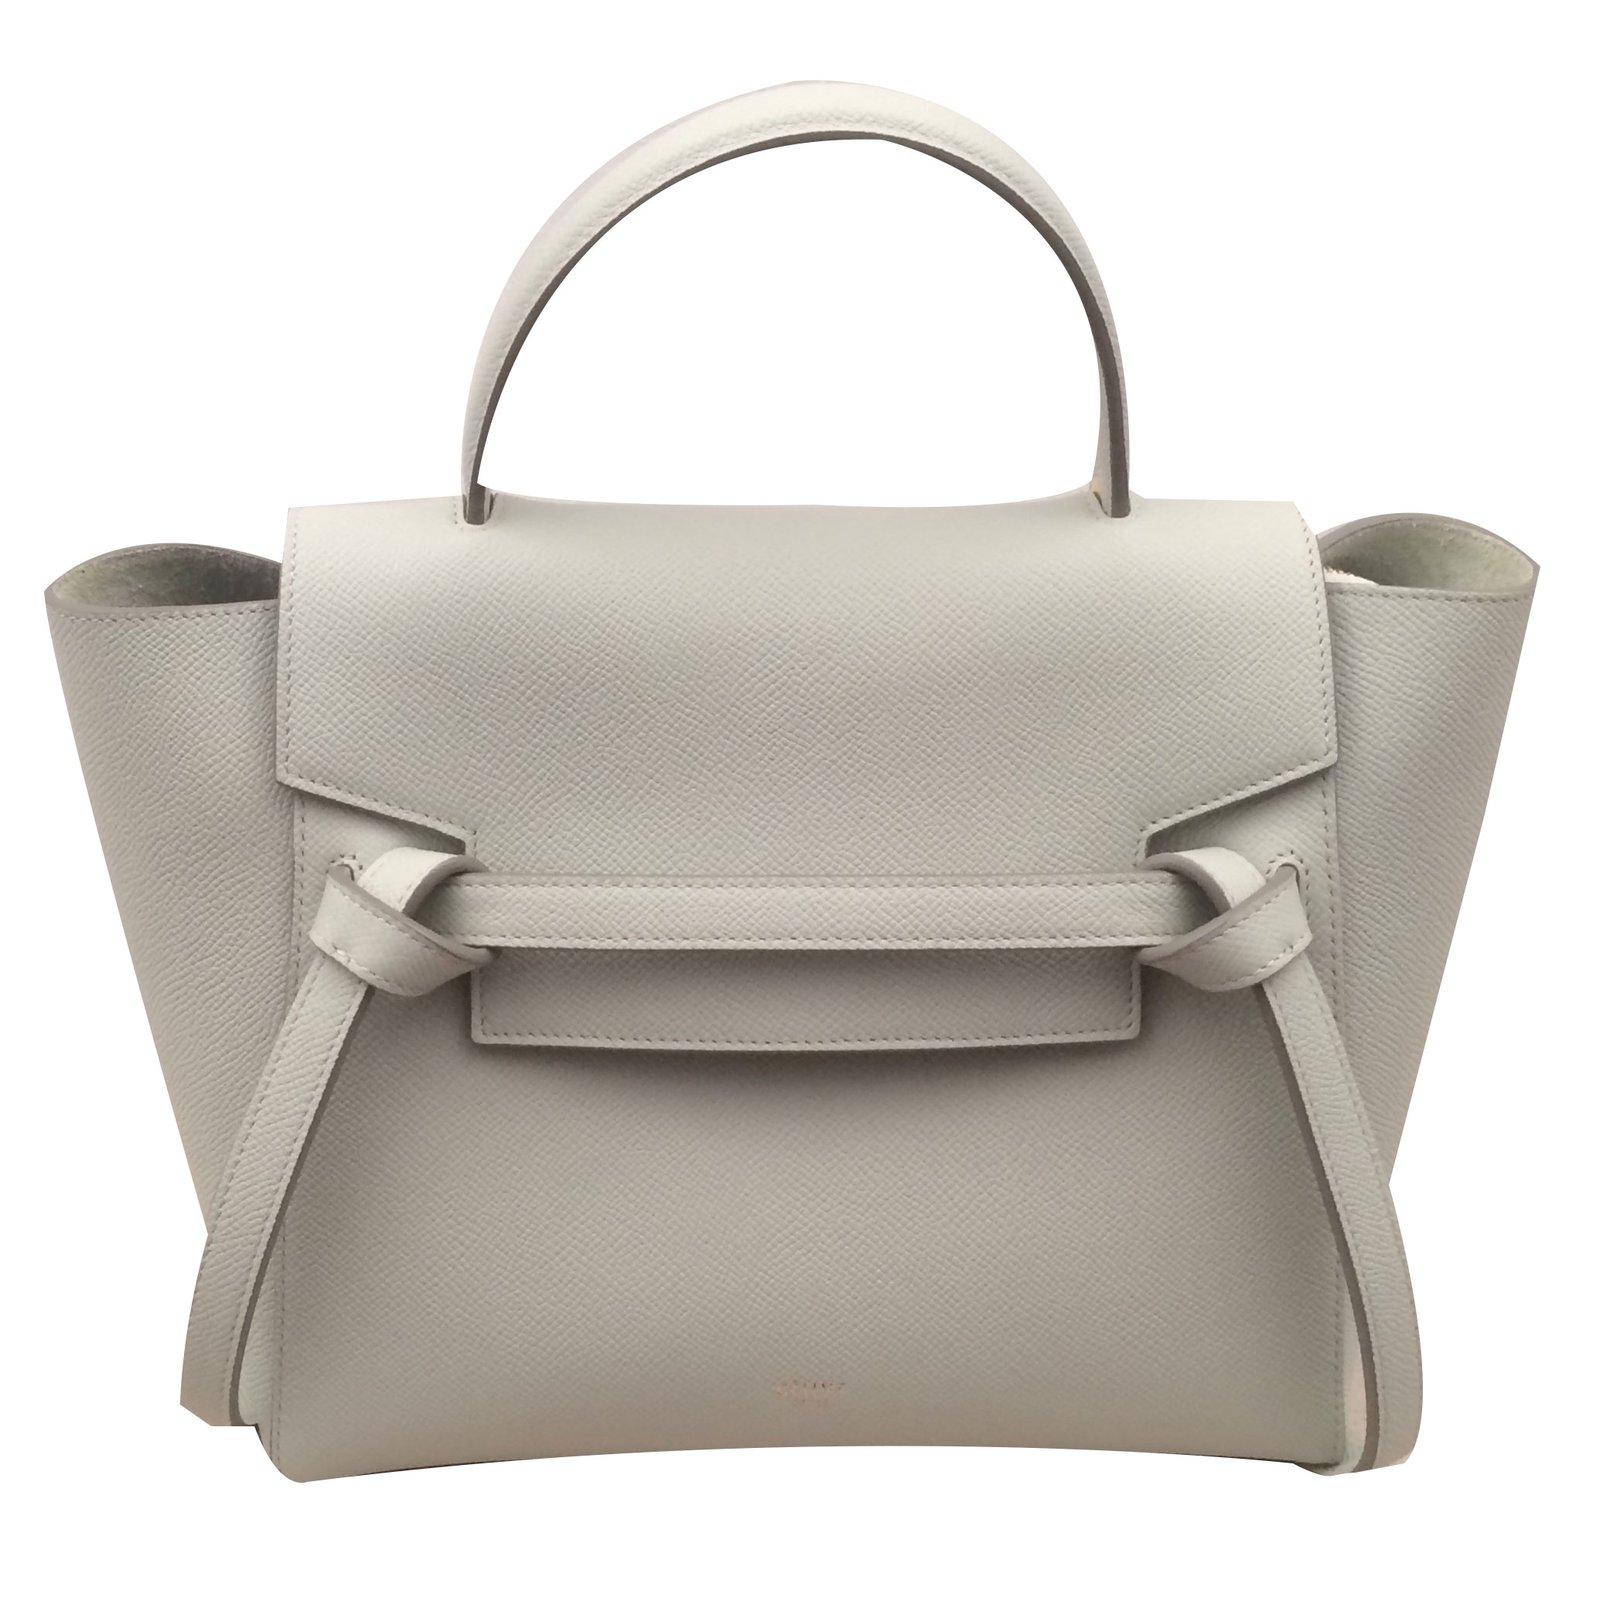 Celine Celine Micro Belt Handbags Leather Green Ref 57406 Joli Closet